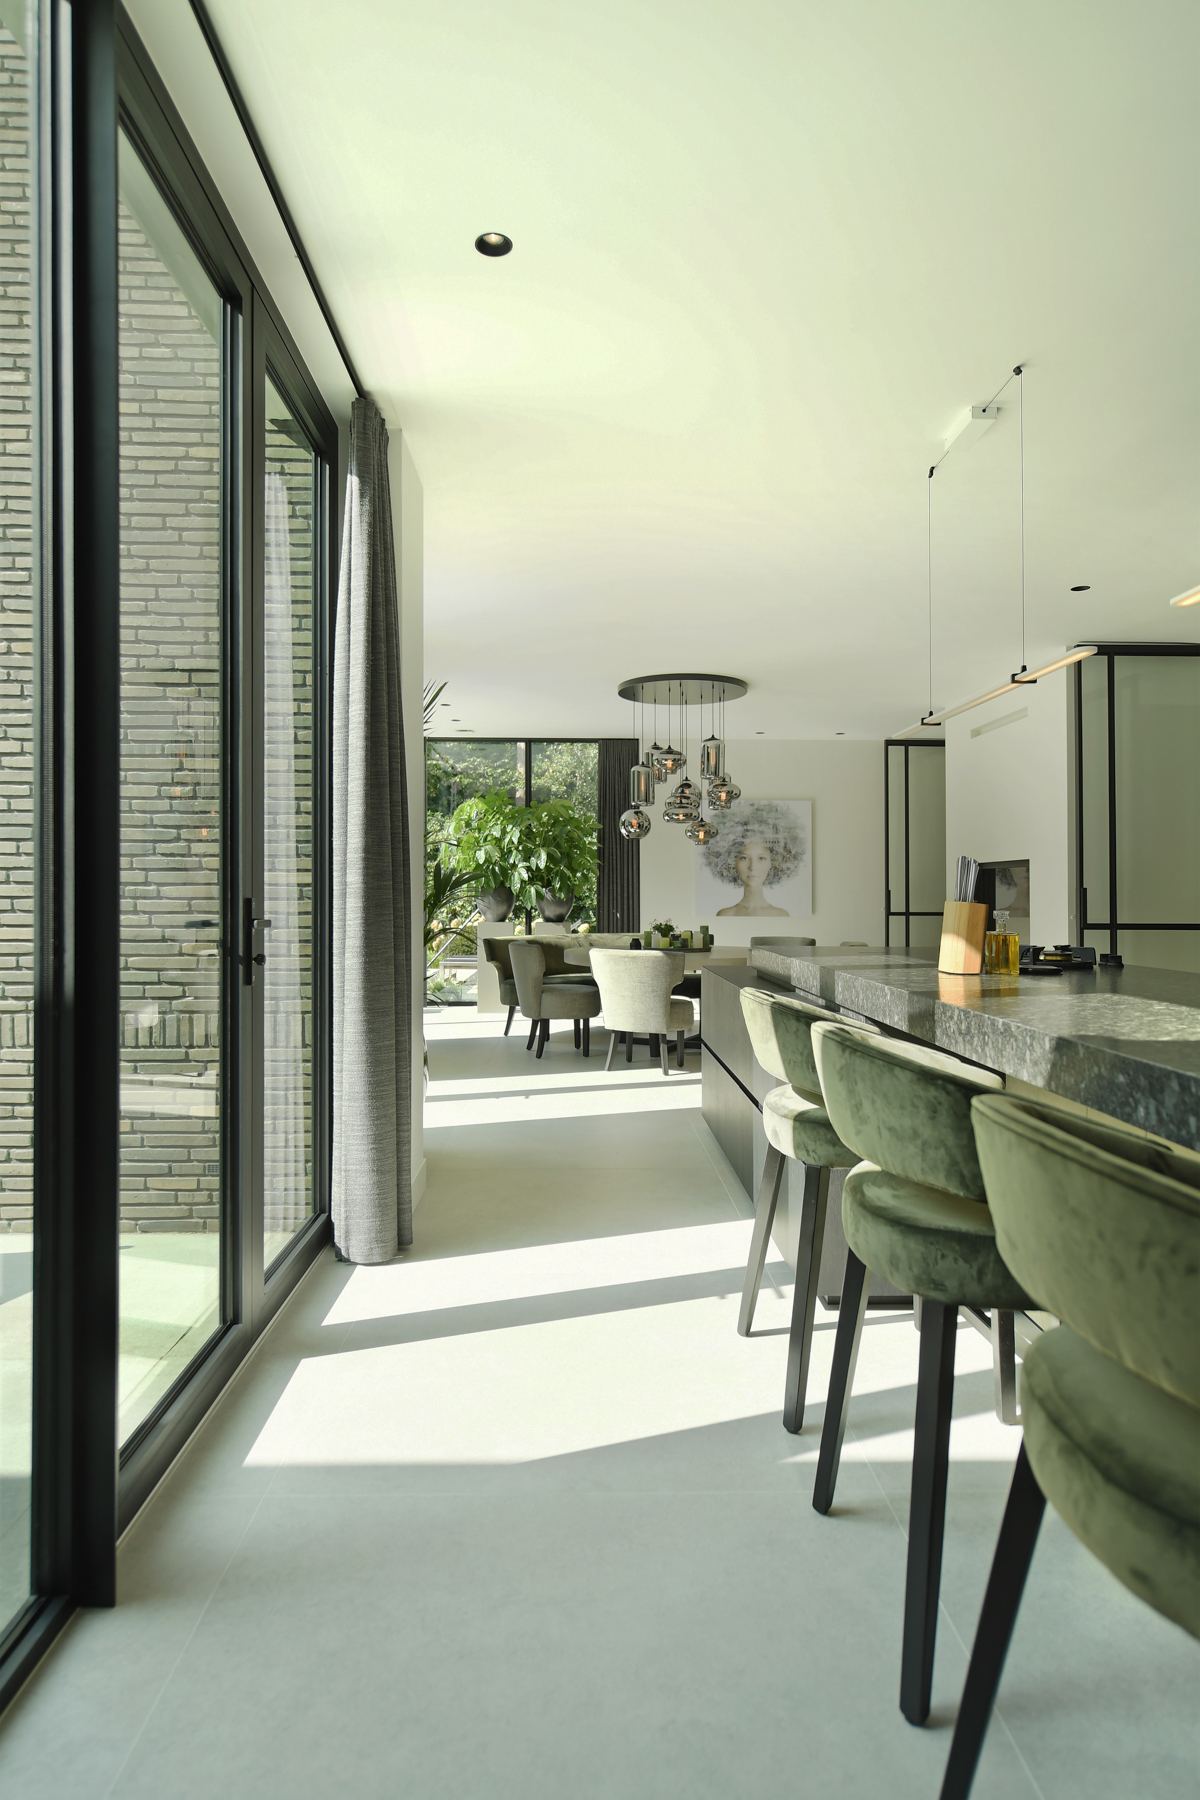 Modern herenhuis met aansprekende architectuur (35)